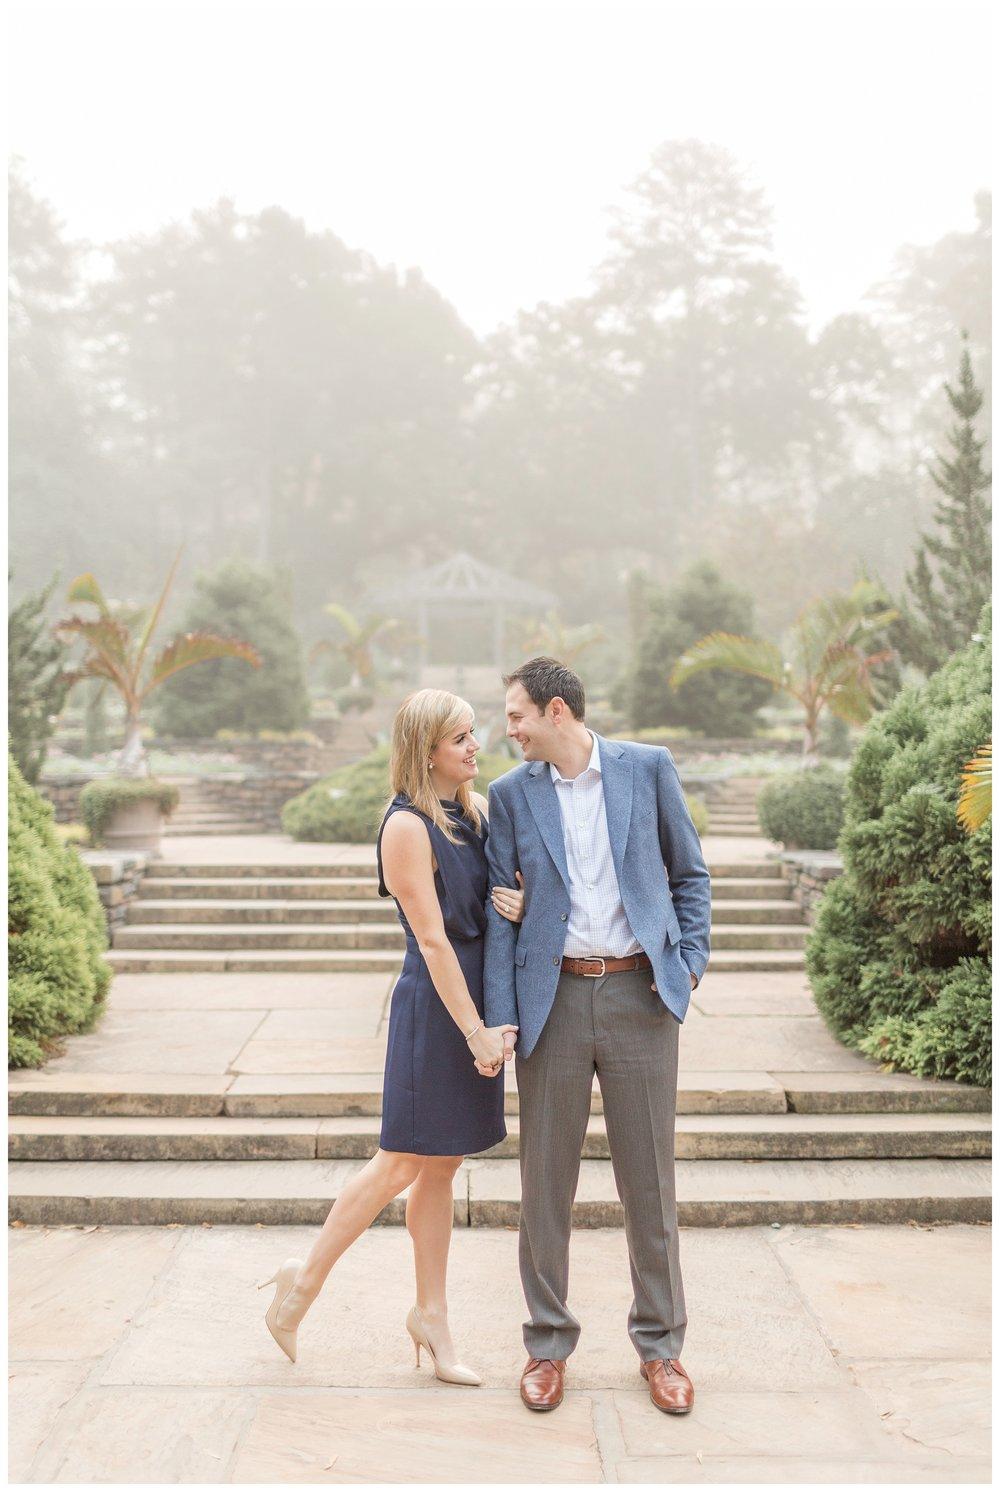 duke-university-engagement-durham-wedding-photographer_0030.jpg